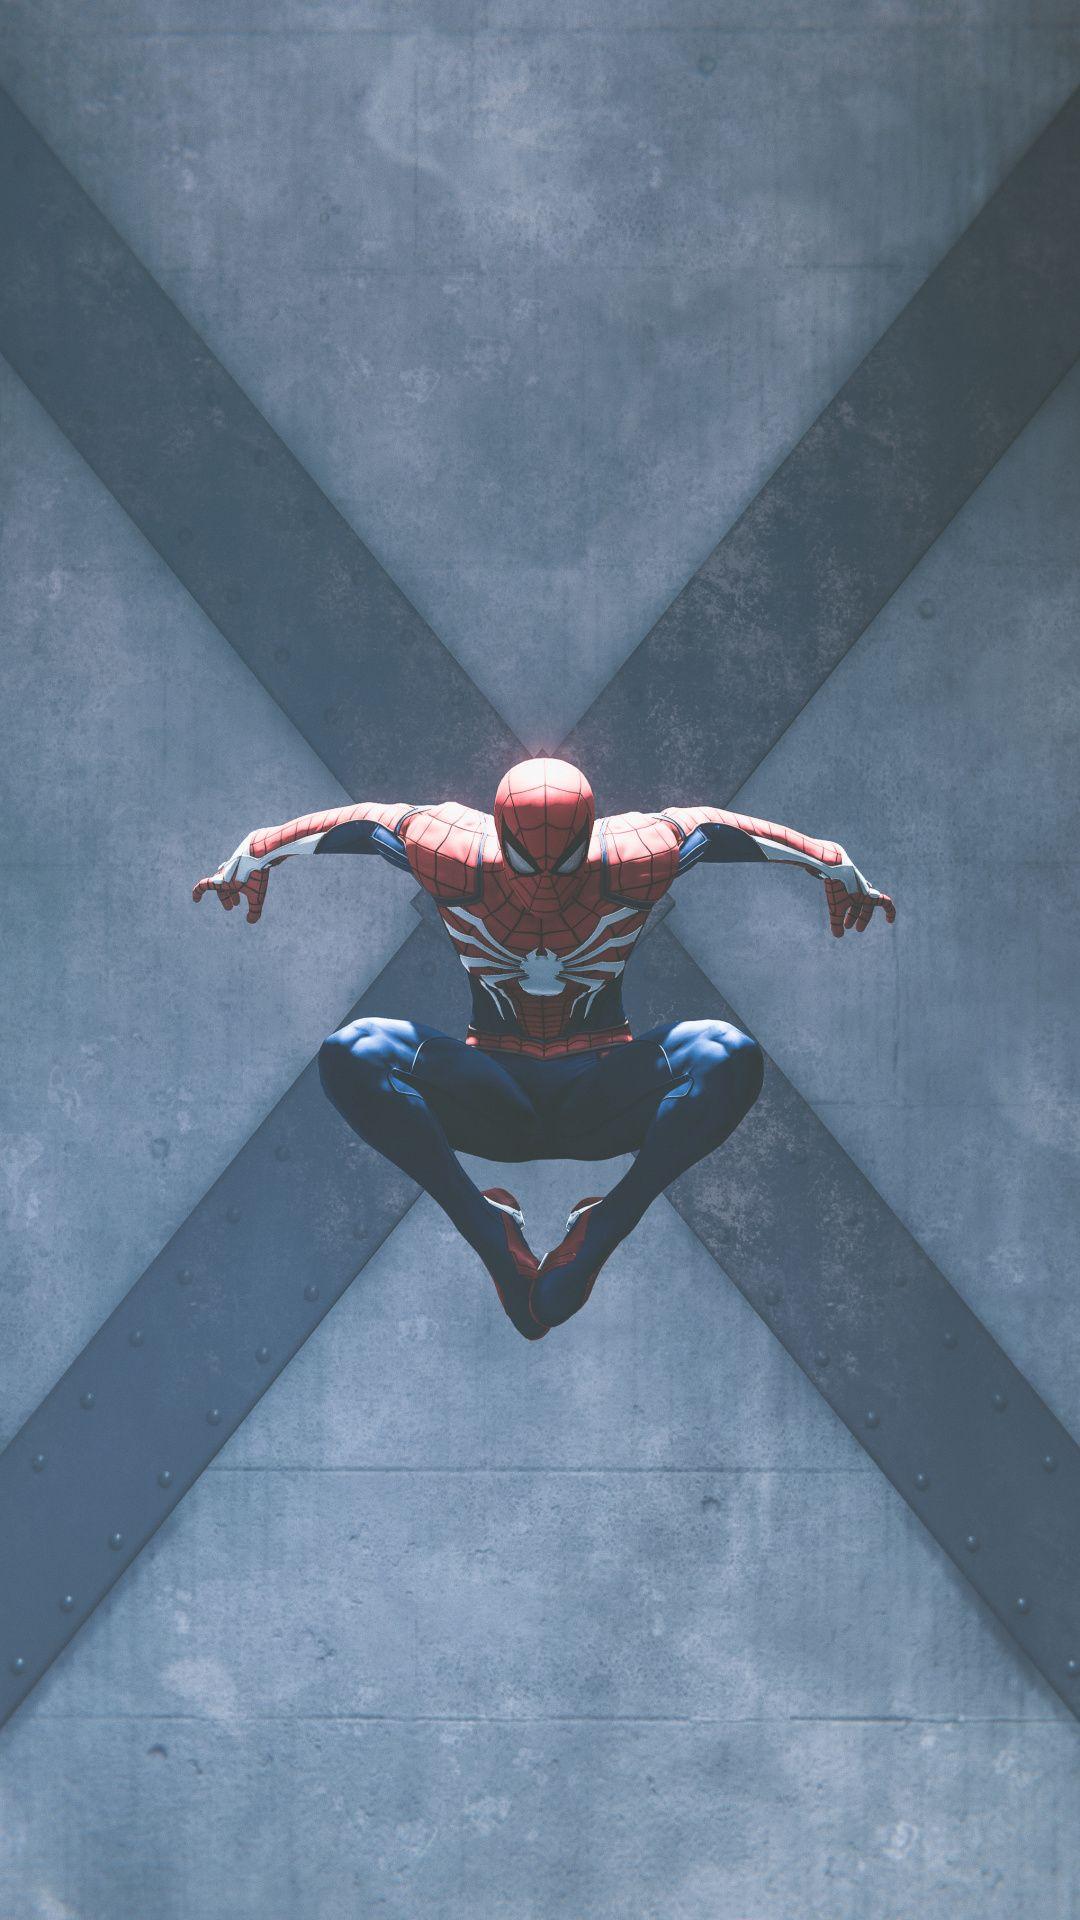 Video game, superhero, PS4, Spiderman, 1080x1920